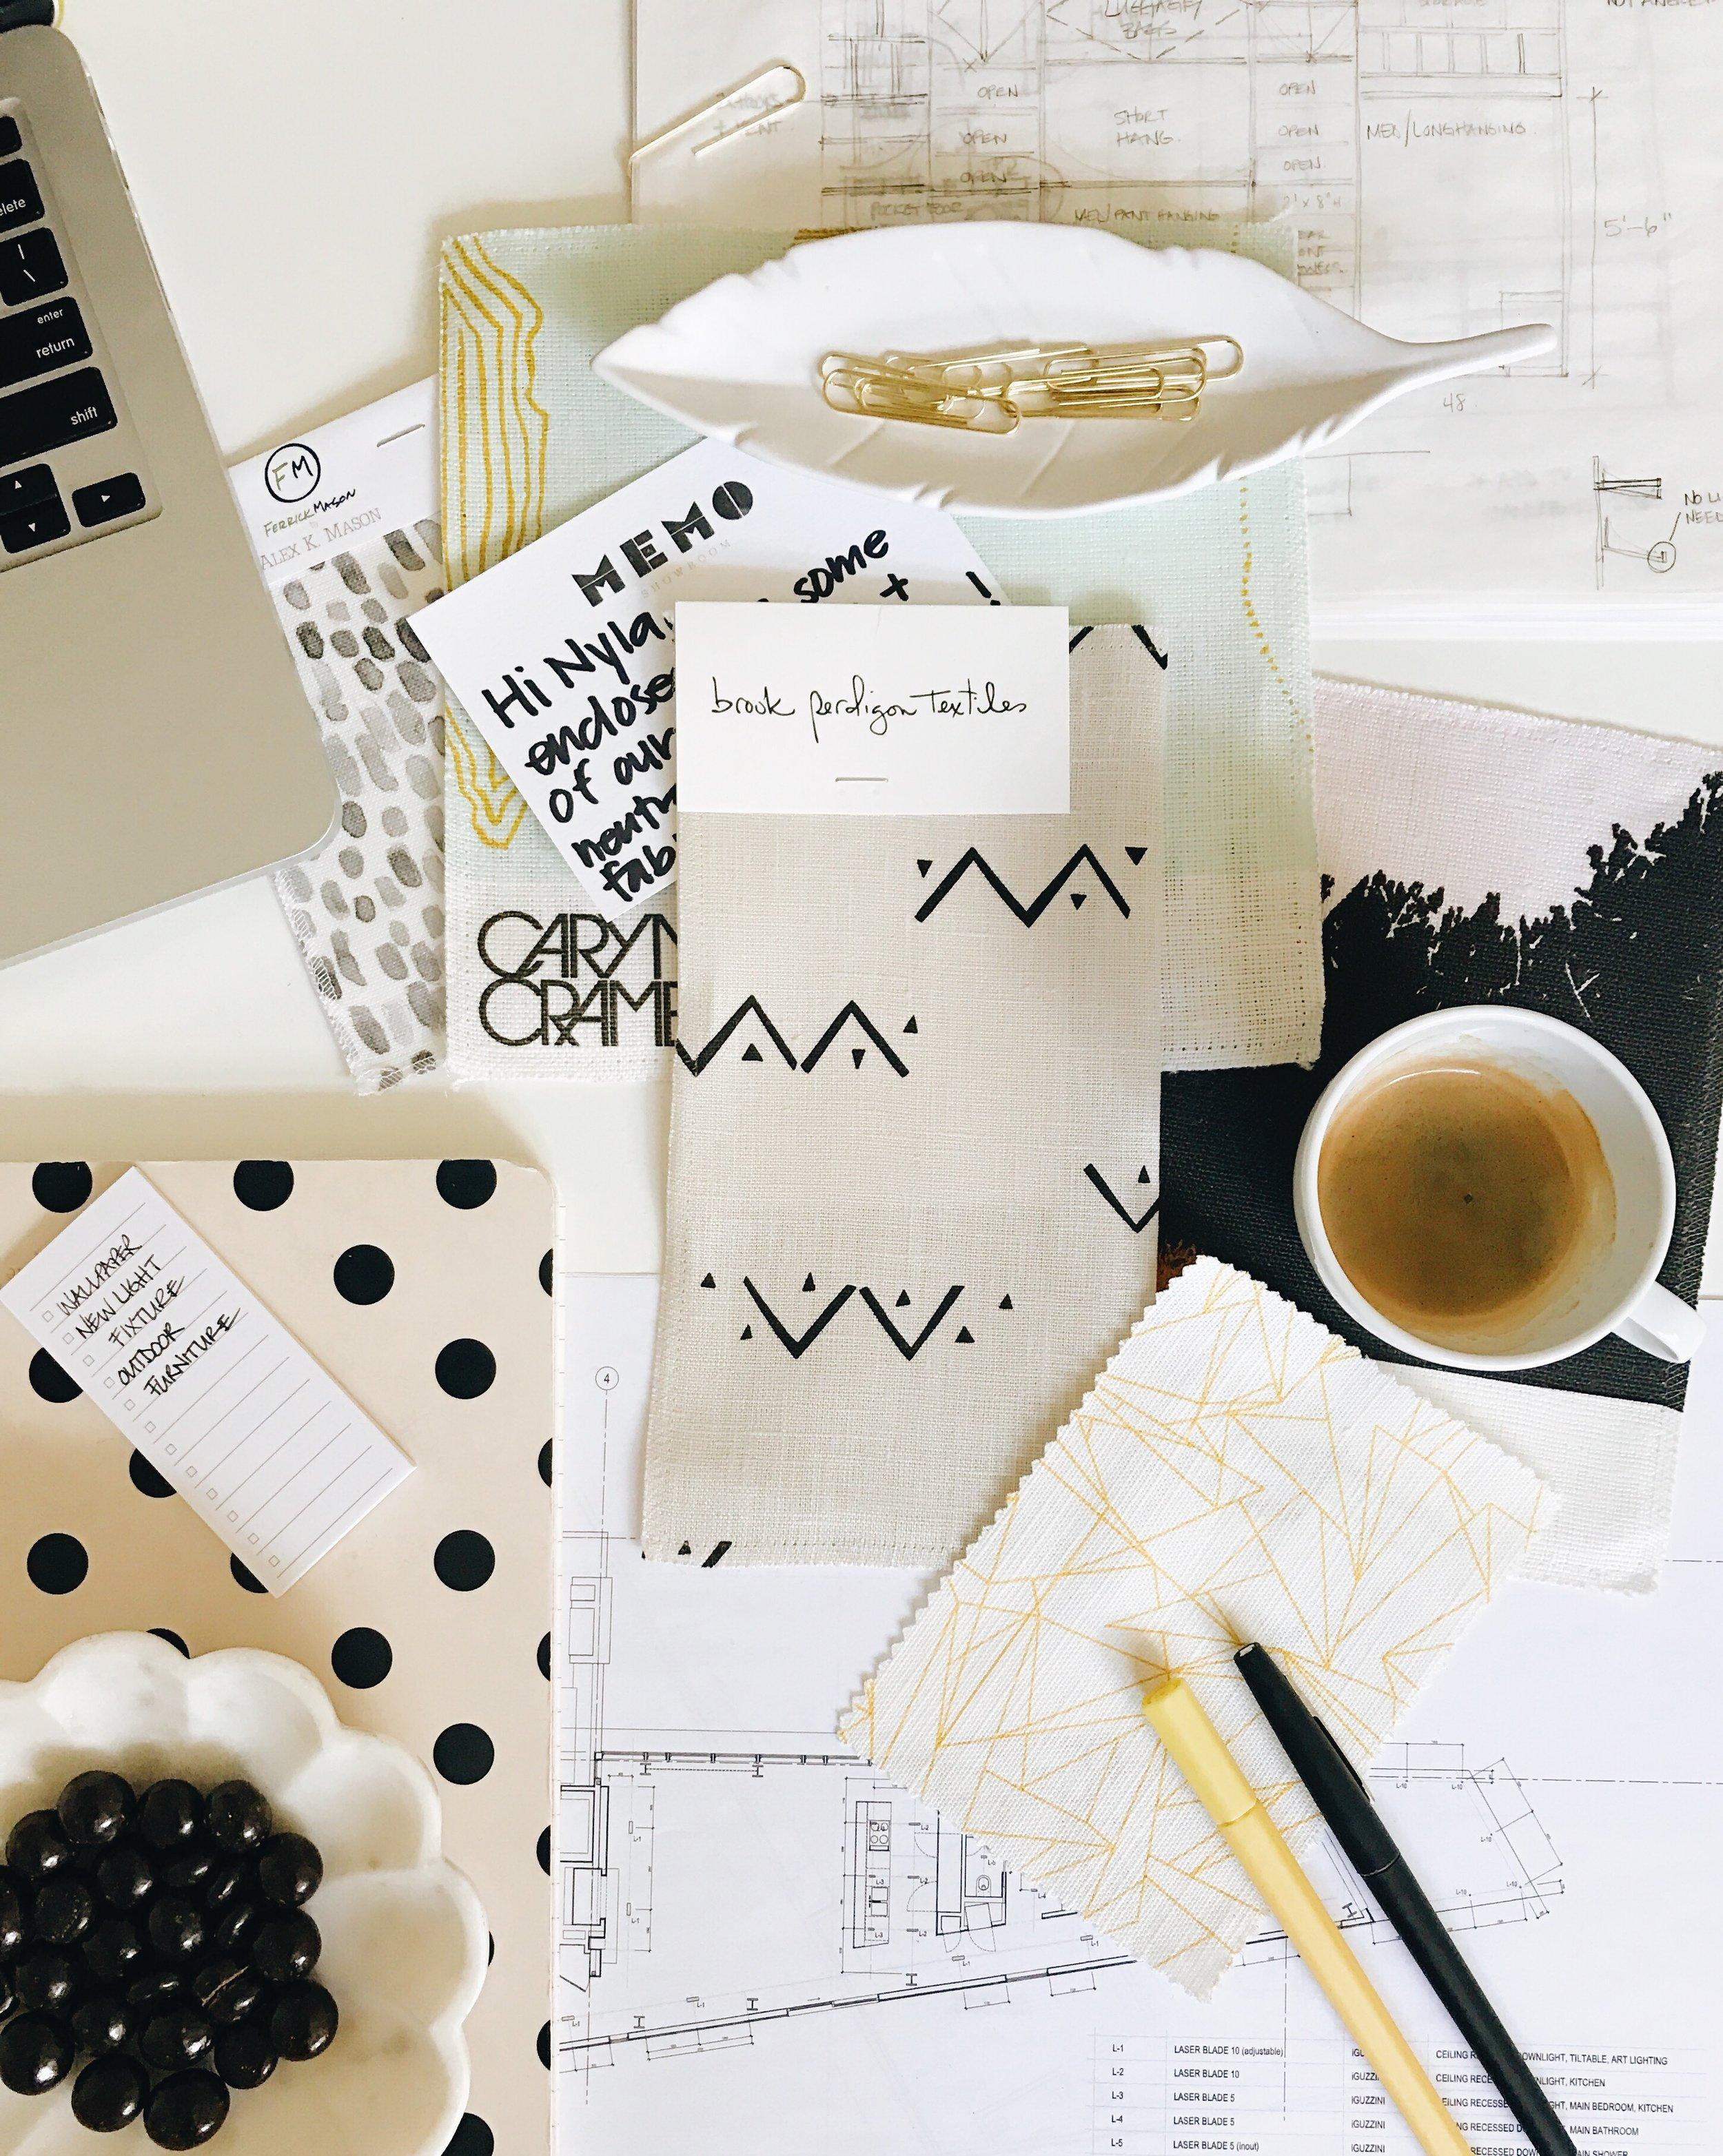 What's On Nyla's Desk, Nyla Free Designs Inc.